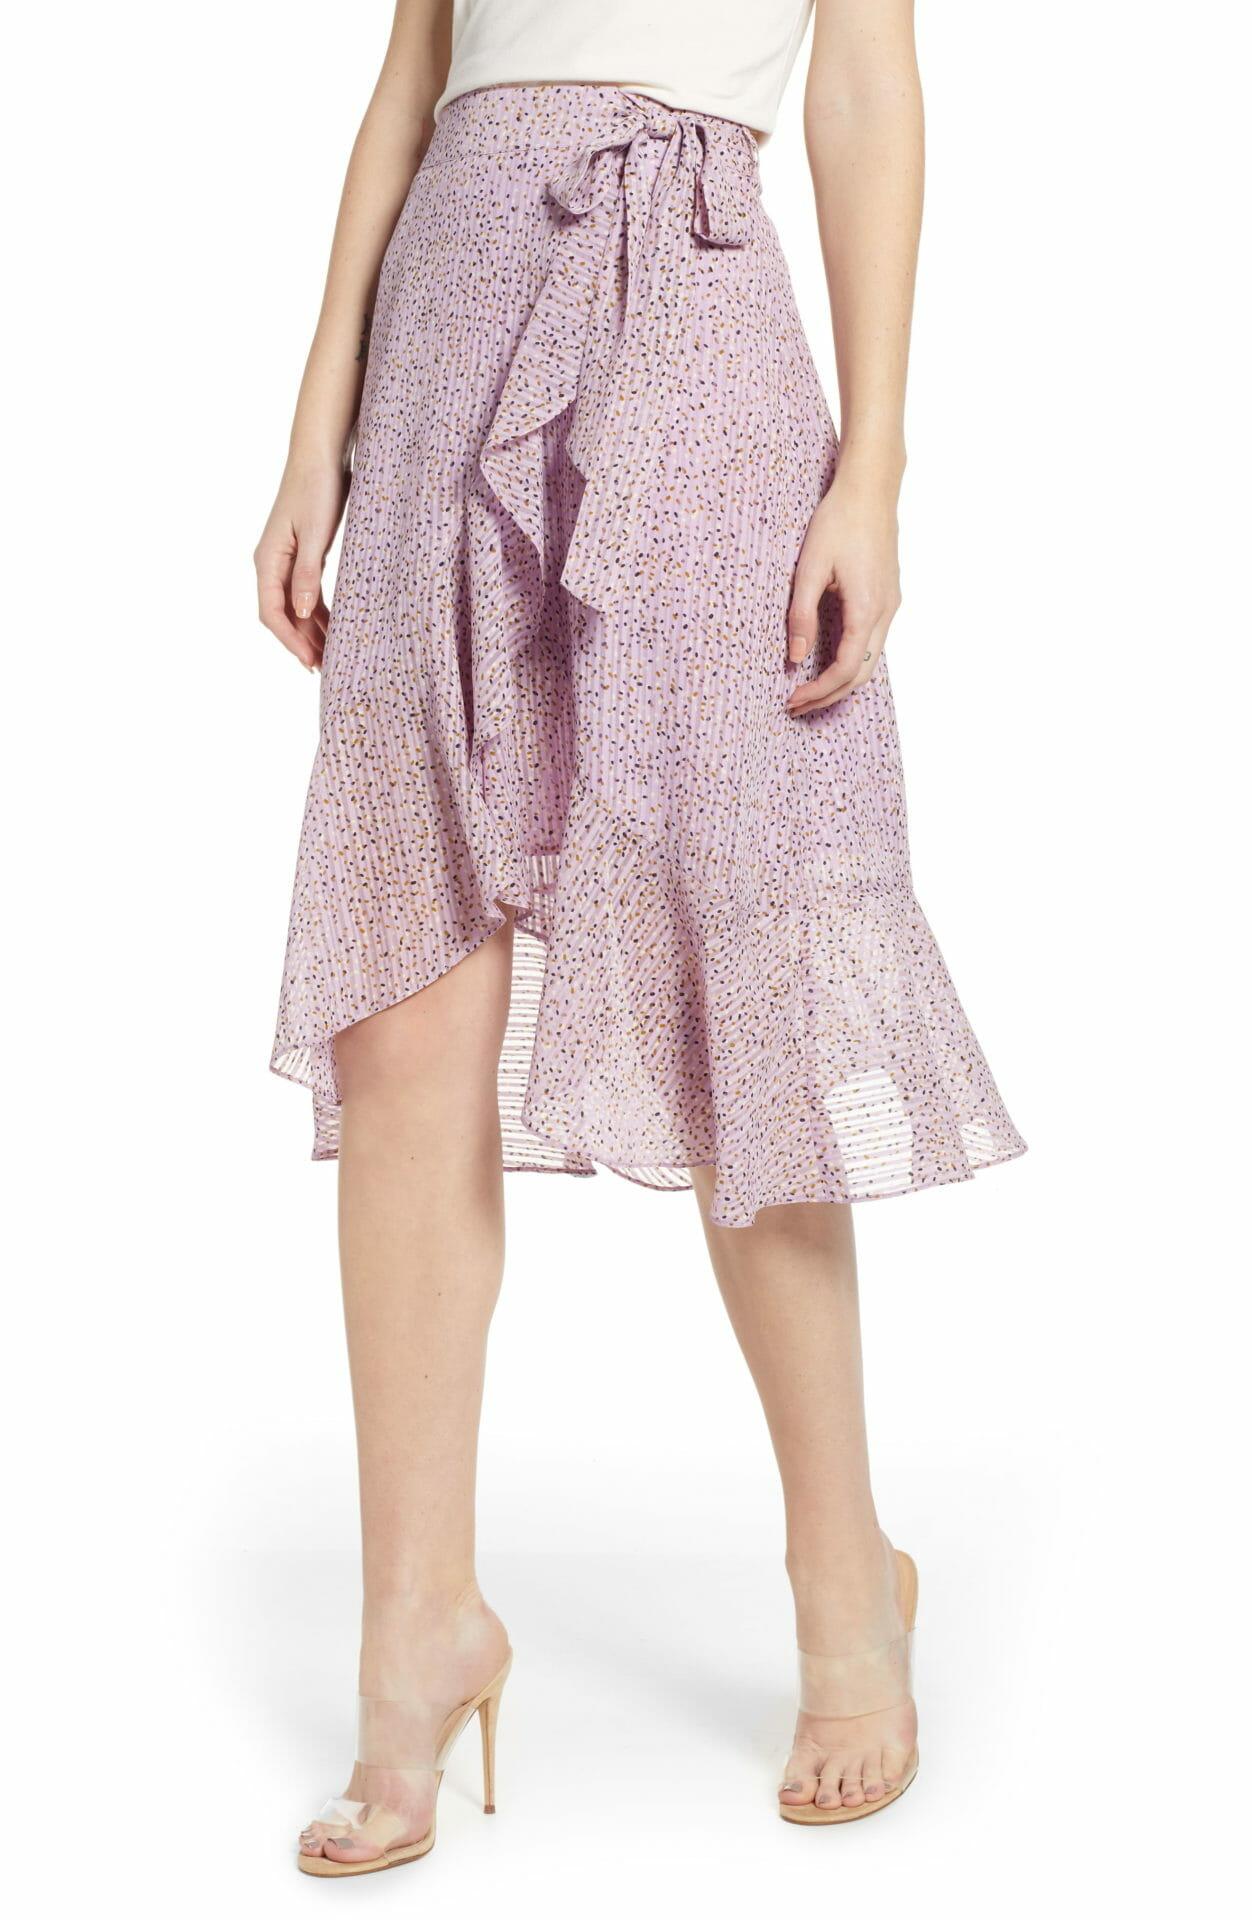 J.O.A. Flounced Wrap Skirt, Main, color, LAVENDER DOT